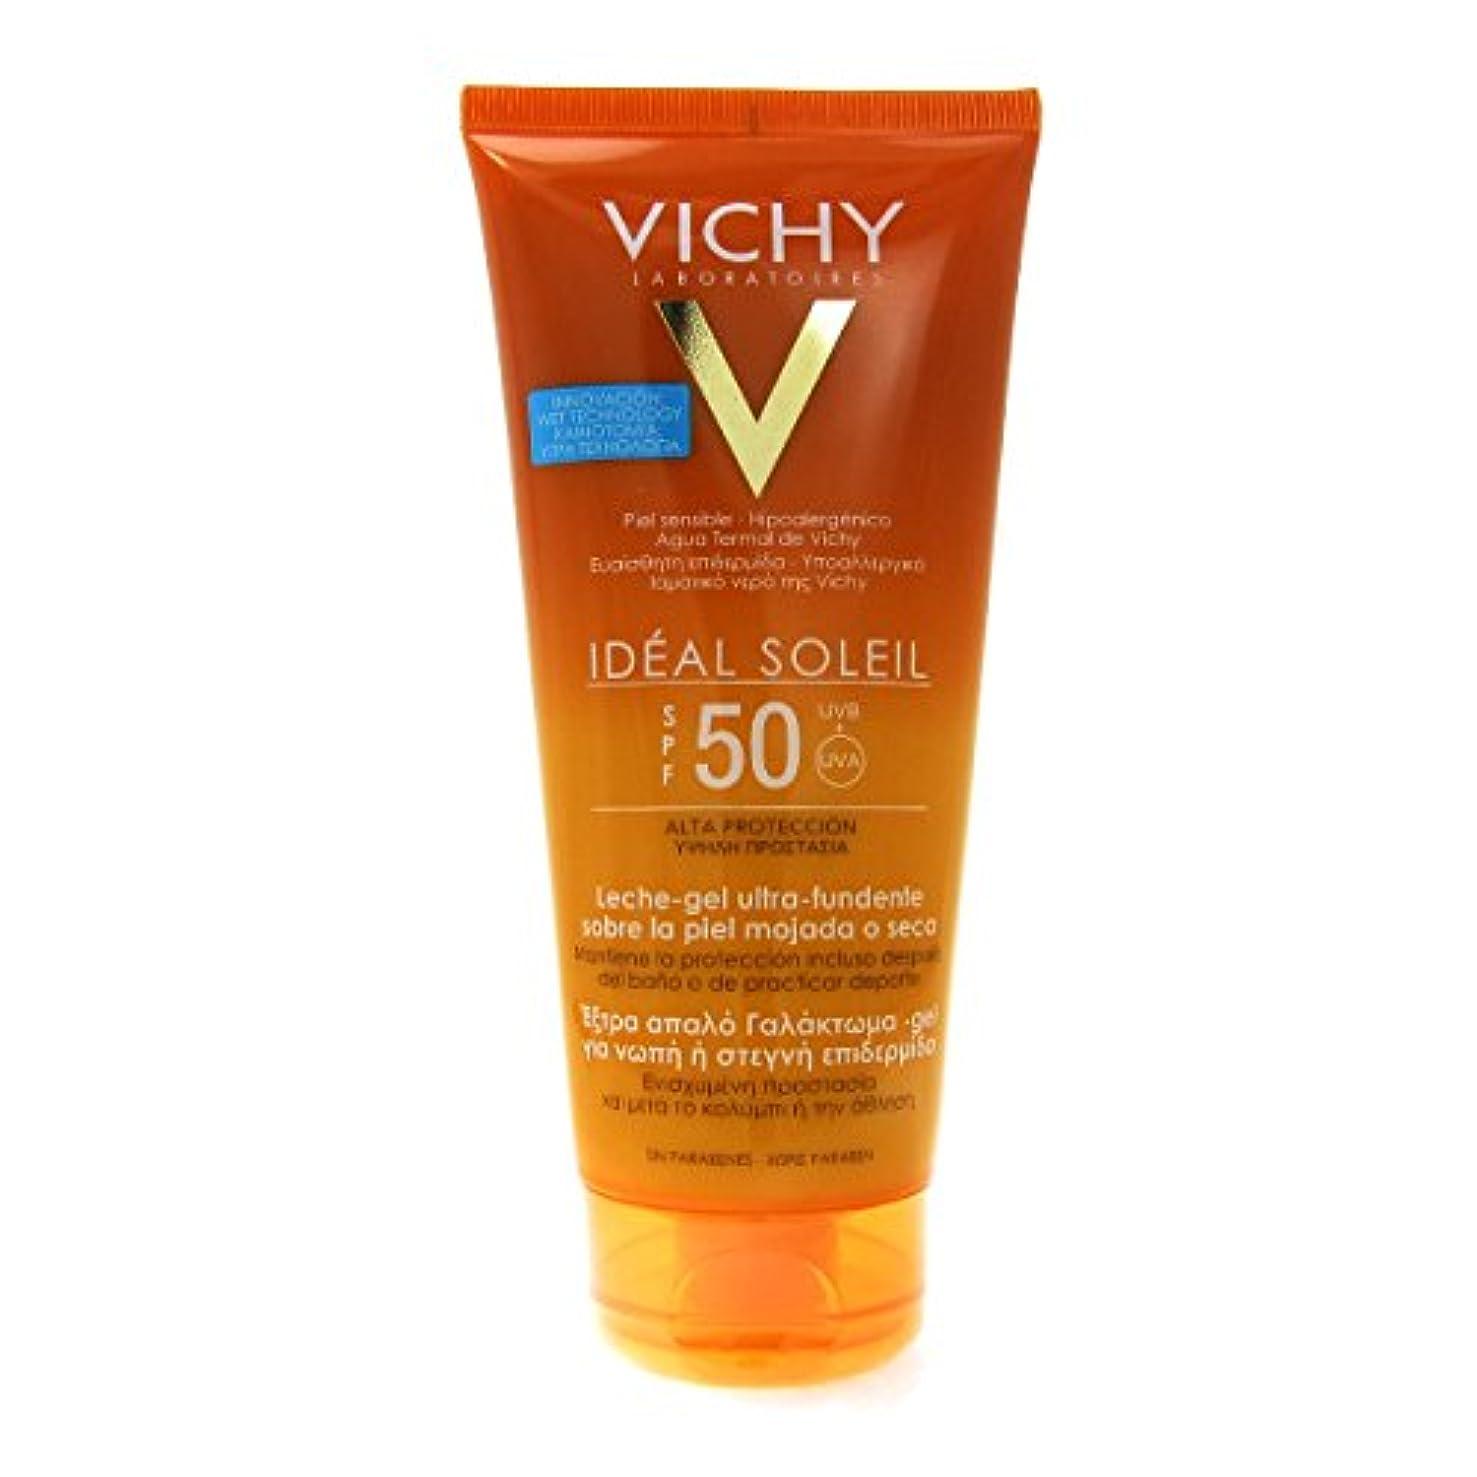 博物館回転攻撃的Vichy Capital Soleil Ideal Soleil Gel-cream Spf50 Face And Body 200ml [並行輸入品]